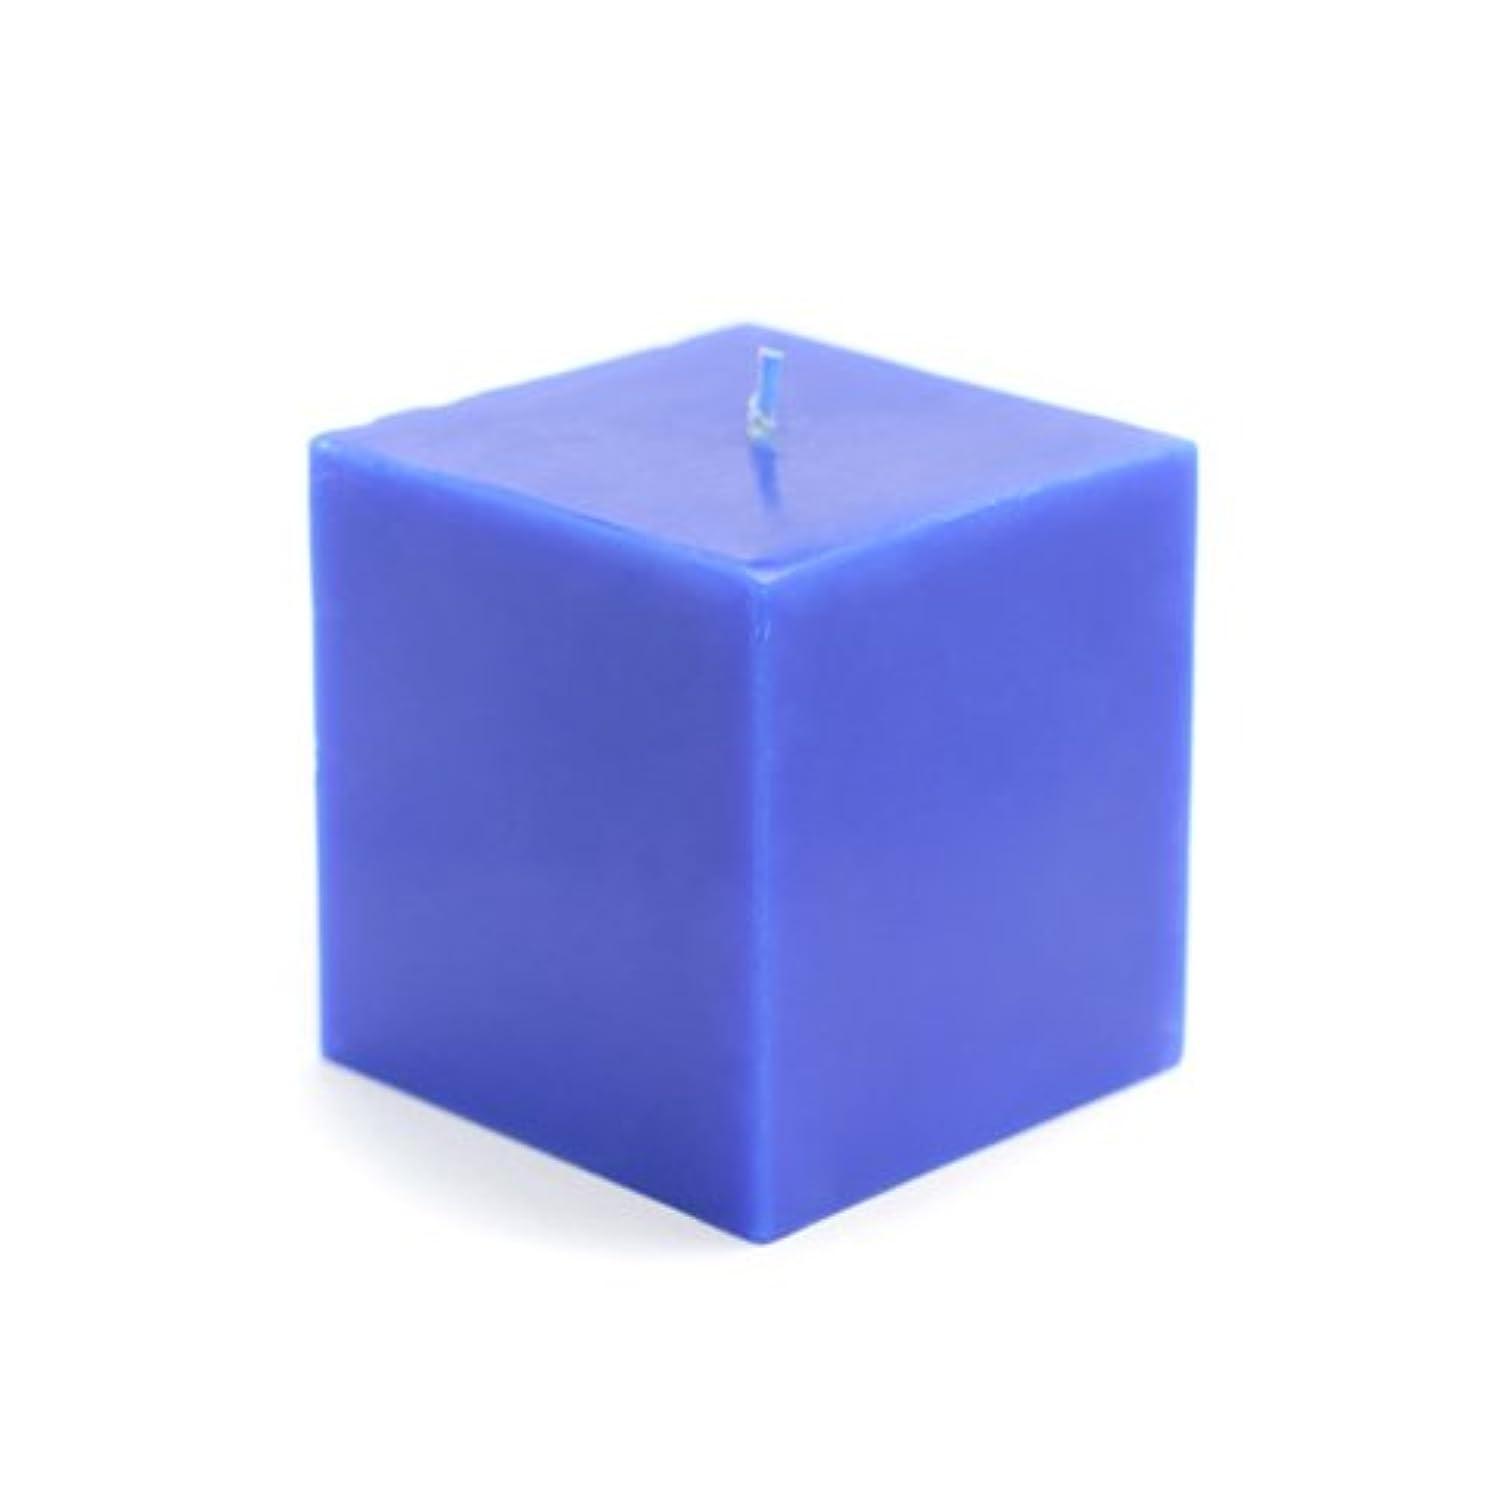 放射能到着ジャムZest Candle CPZ-134-12 3 x 3 in. Blue Square Pillar Candles -12pcs-Case- Bulk